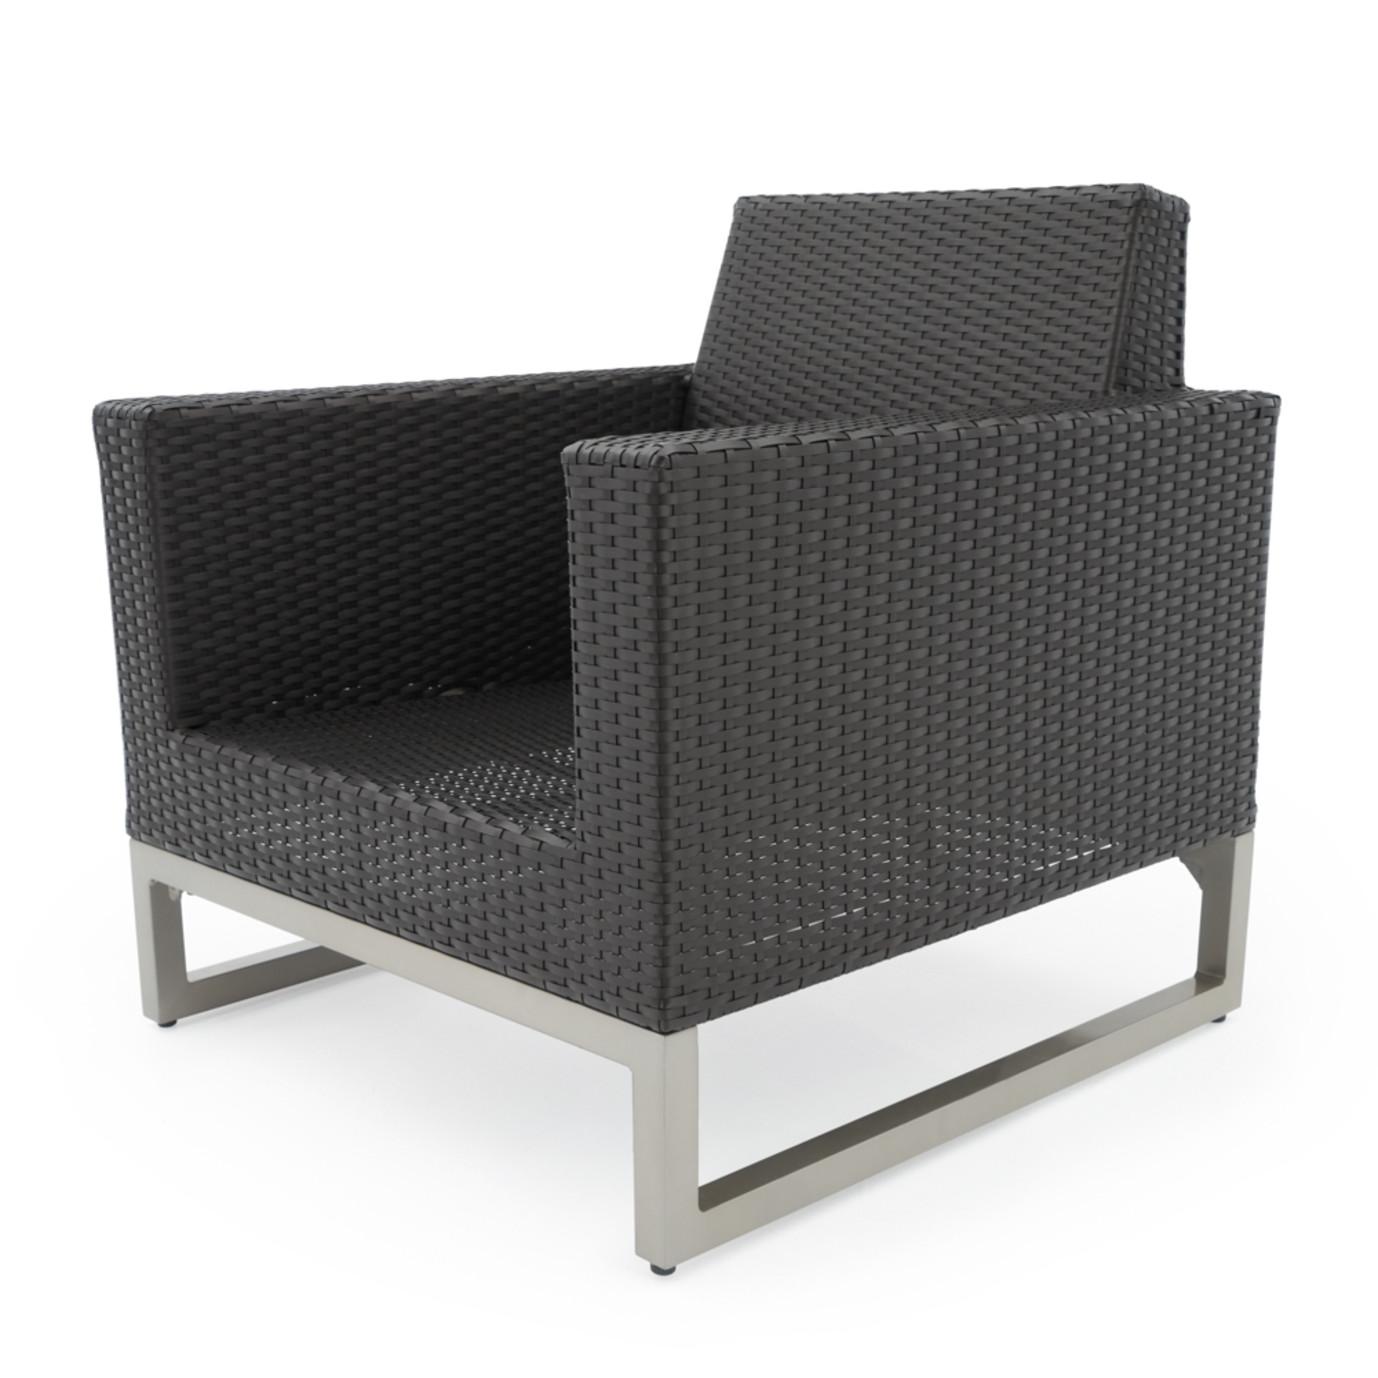 Milo™ Espresso Club Chairs - Slate Gray